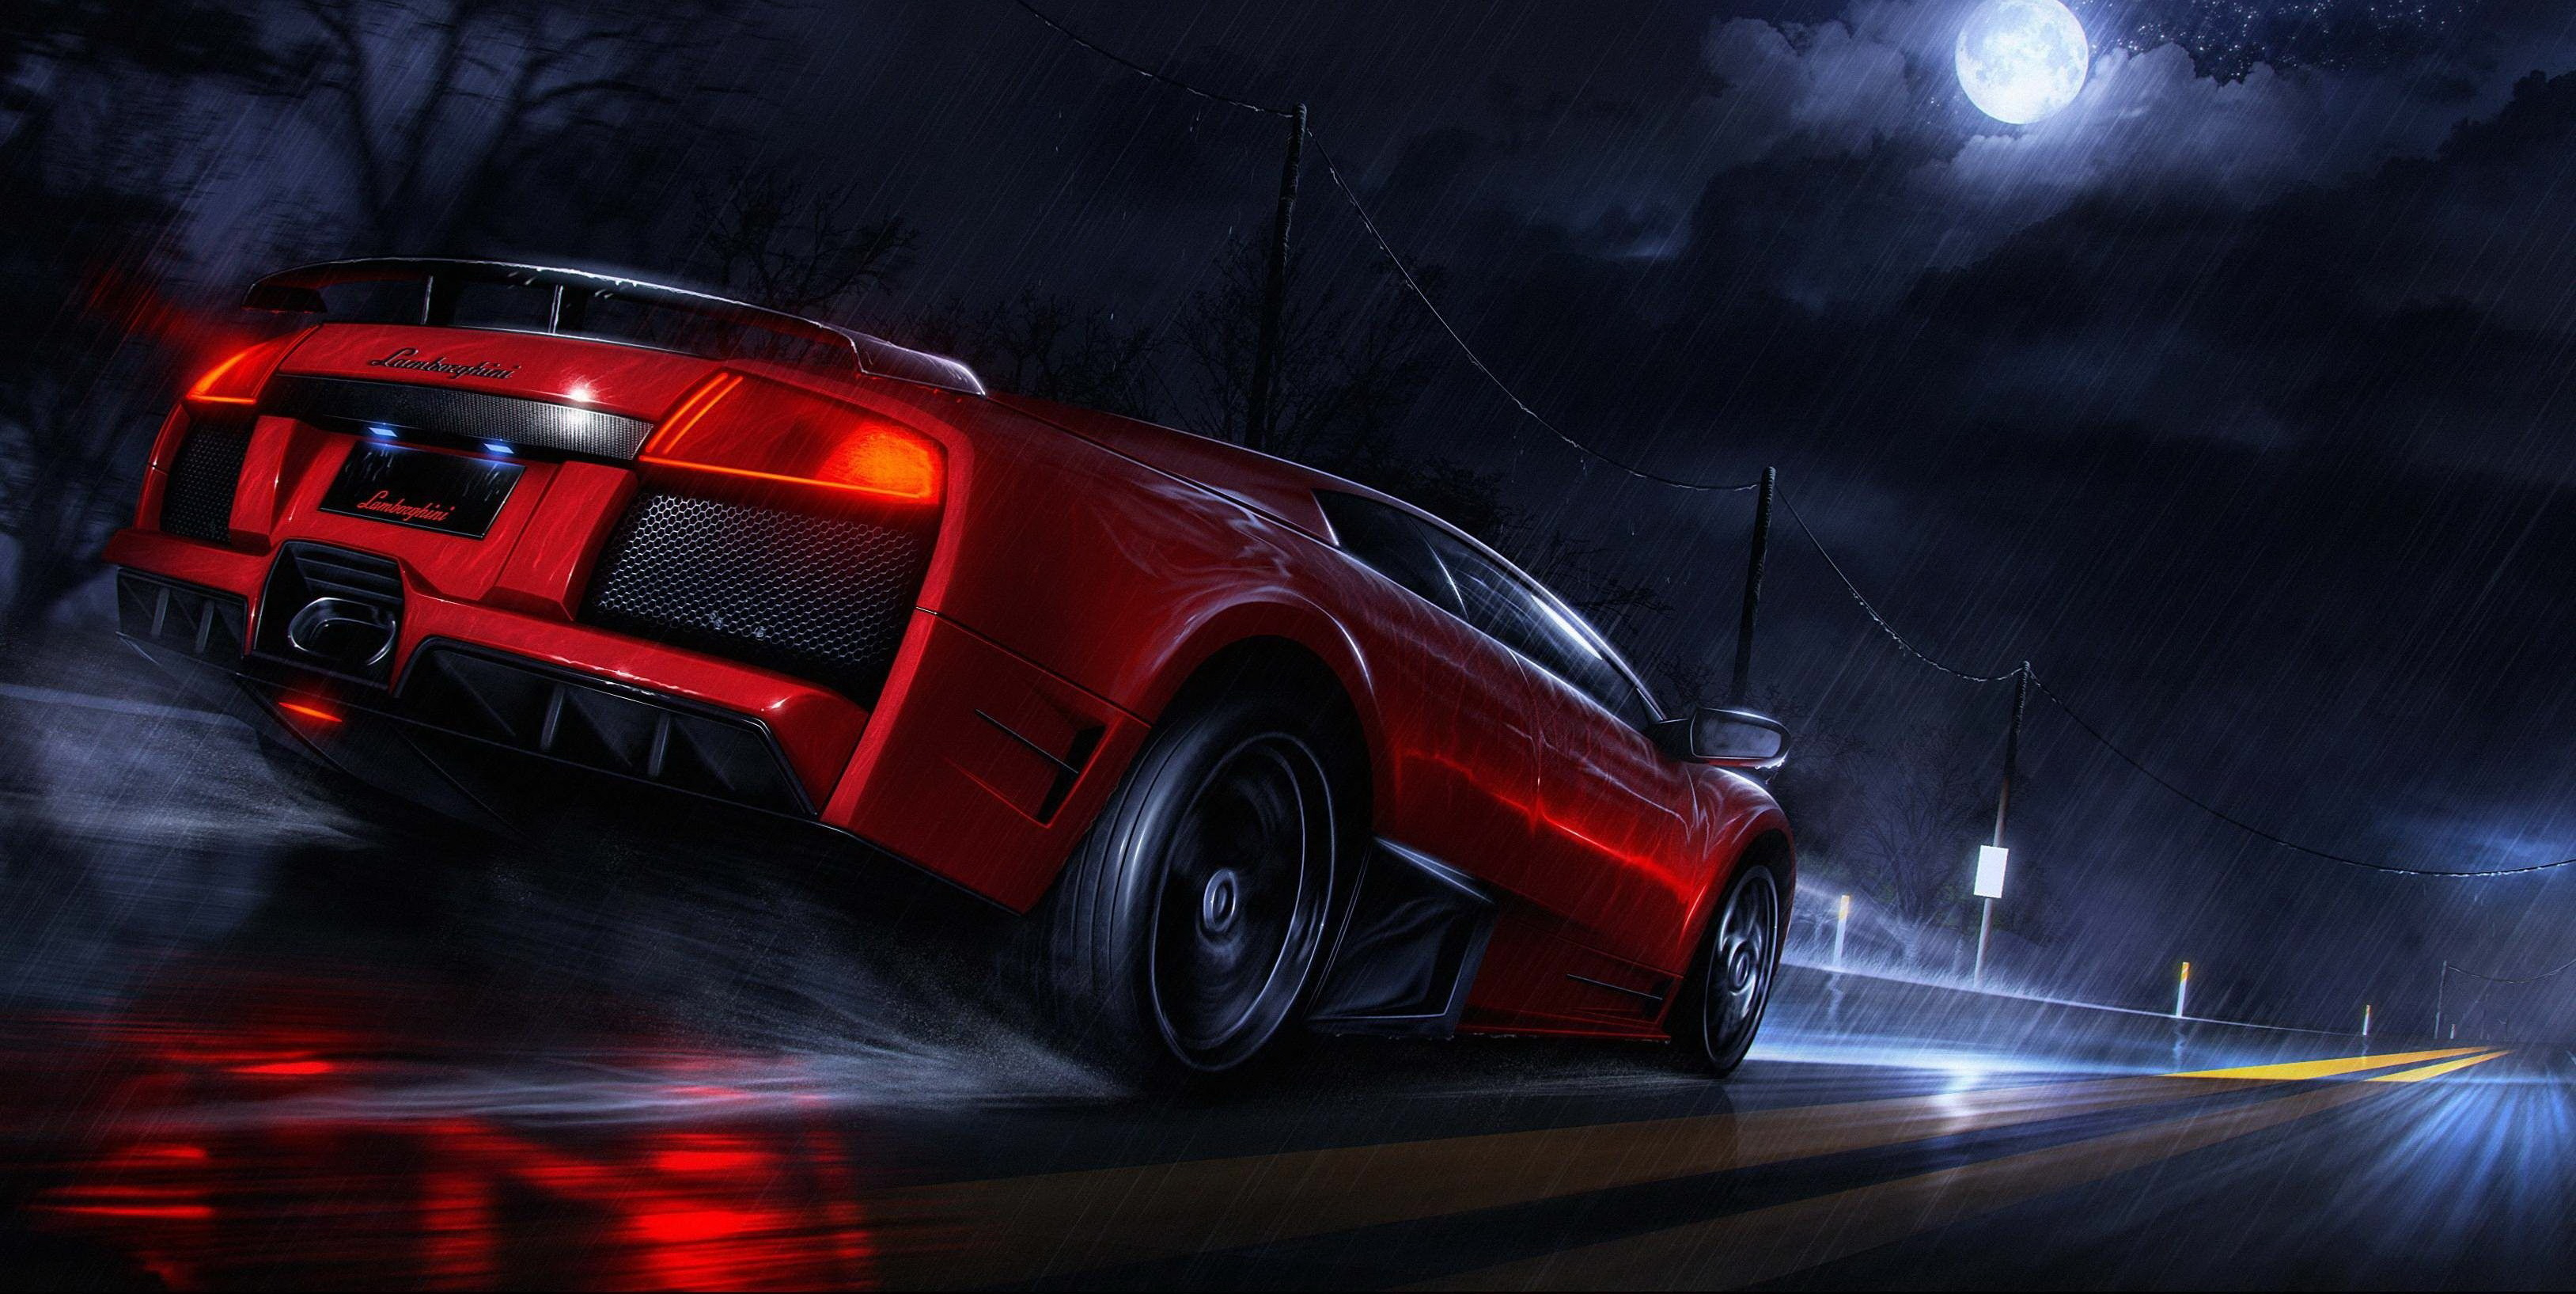 Image: Supercar, red, Lamborghini, road, moon, night, rain, speed, splashes